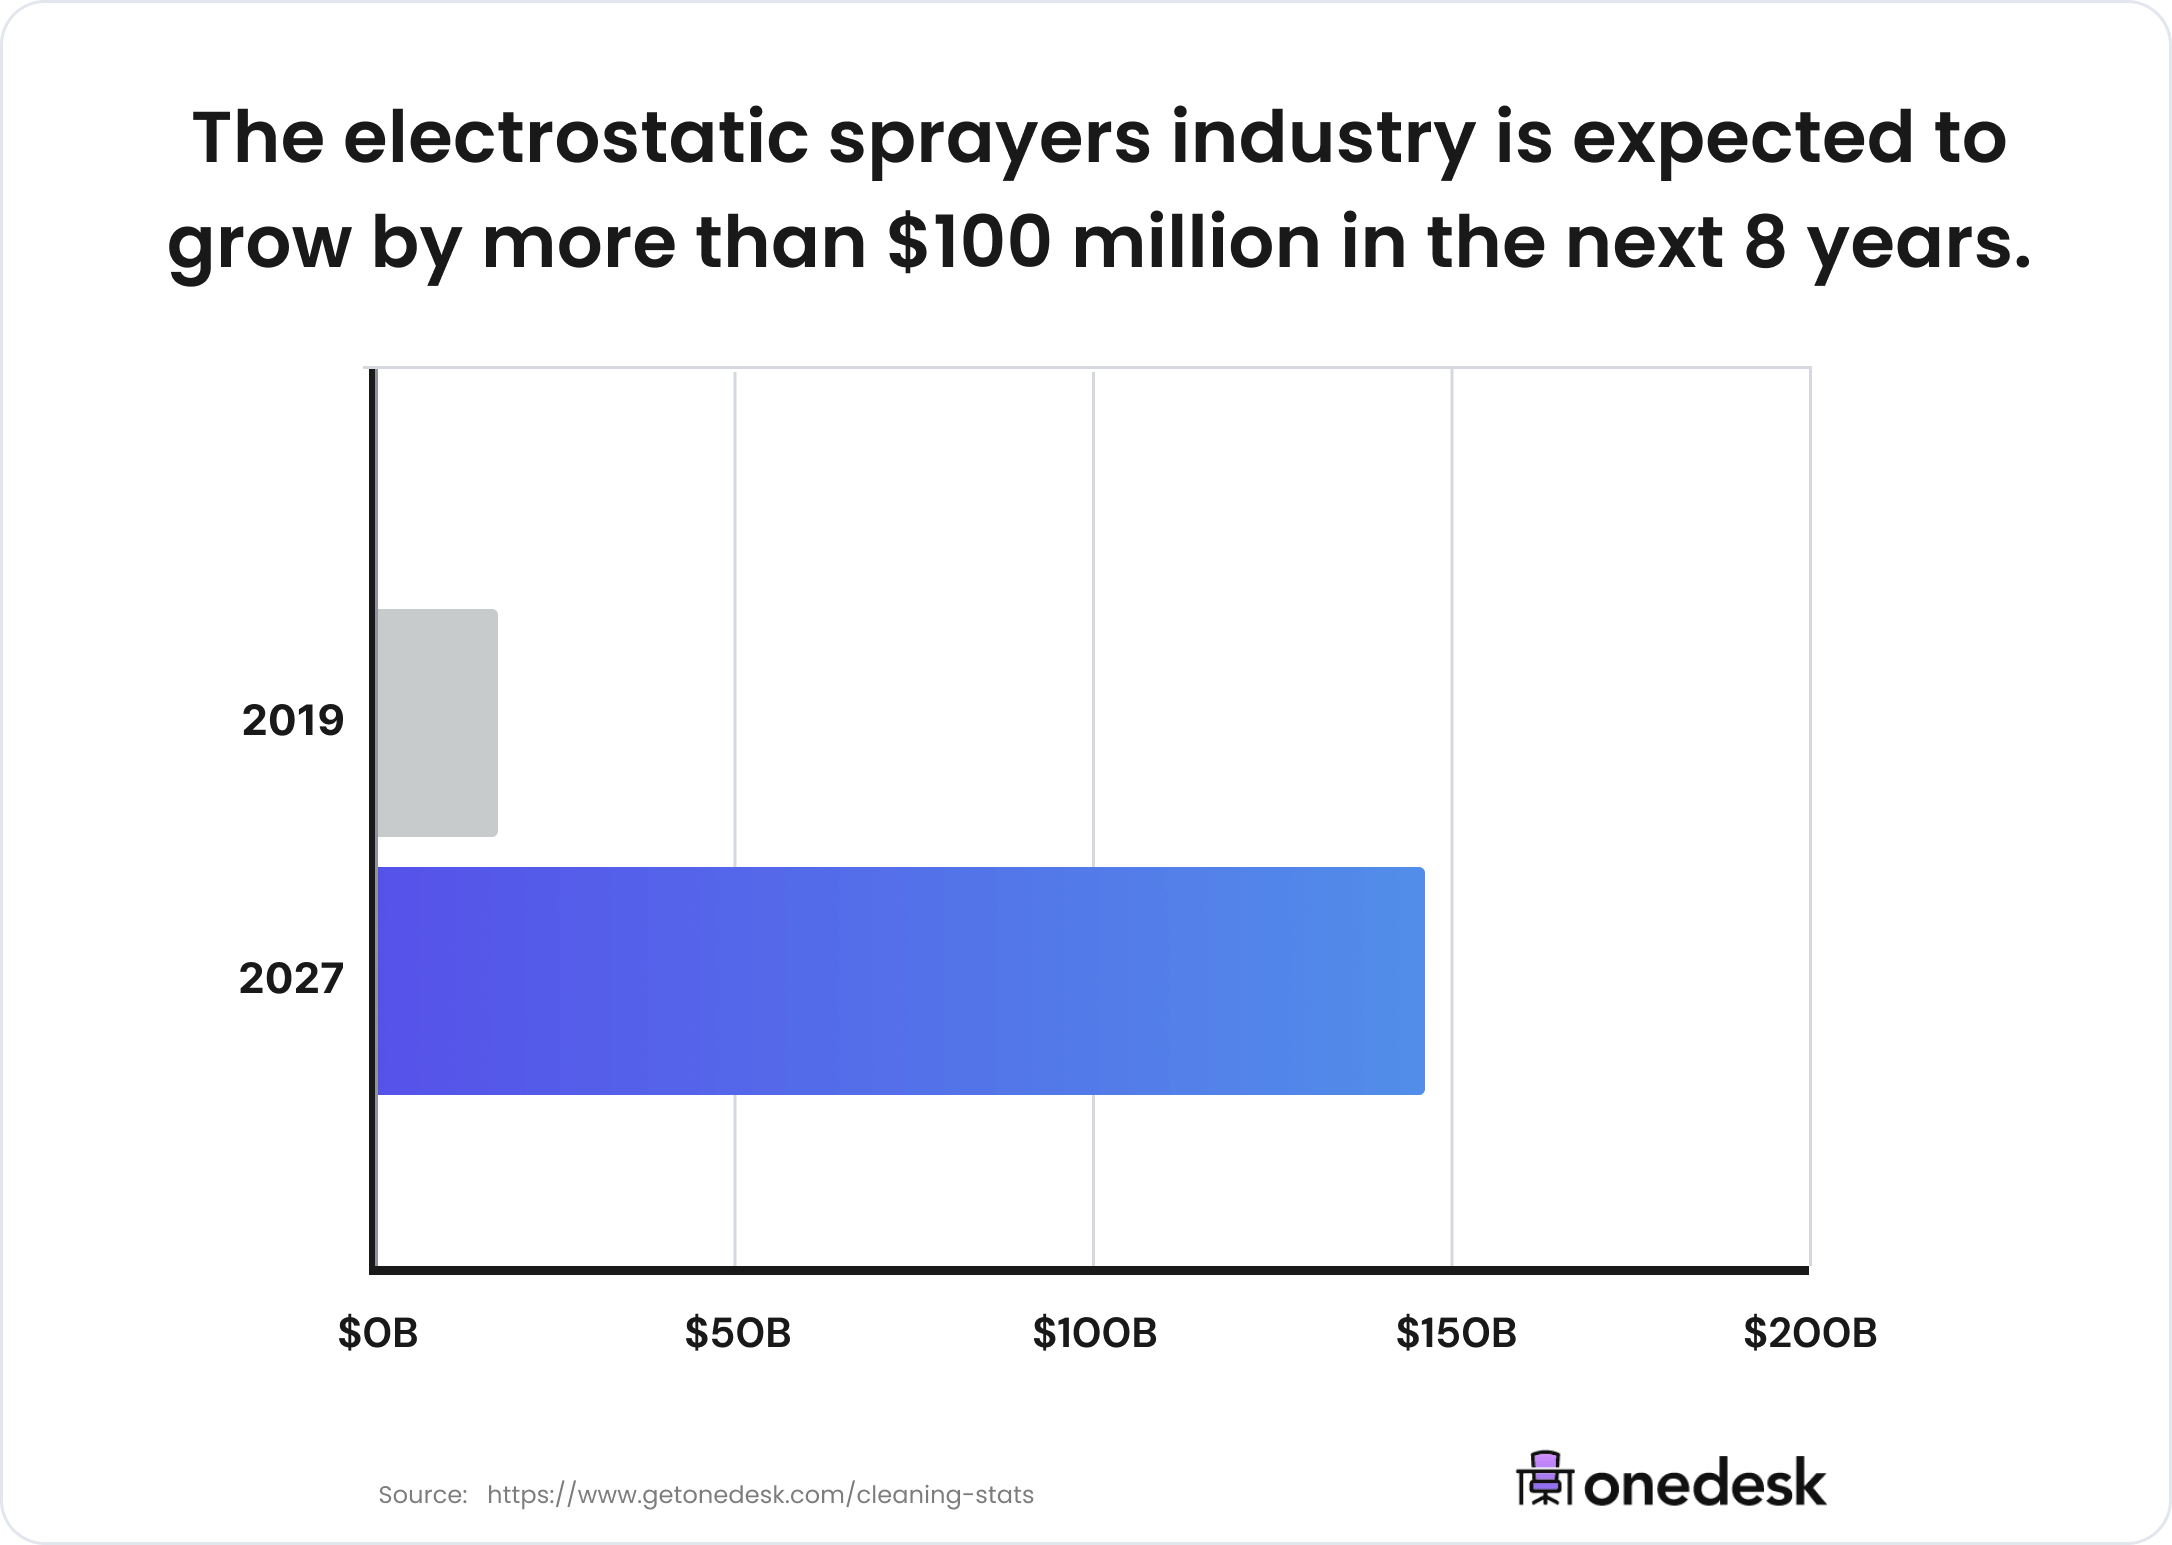 electrostatic sprayers industry growth